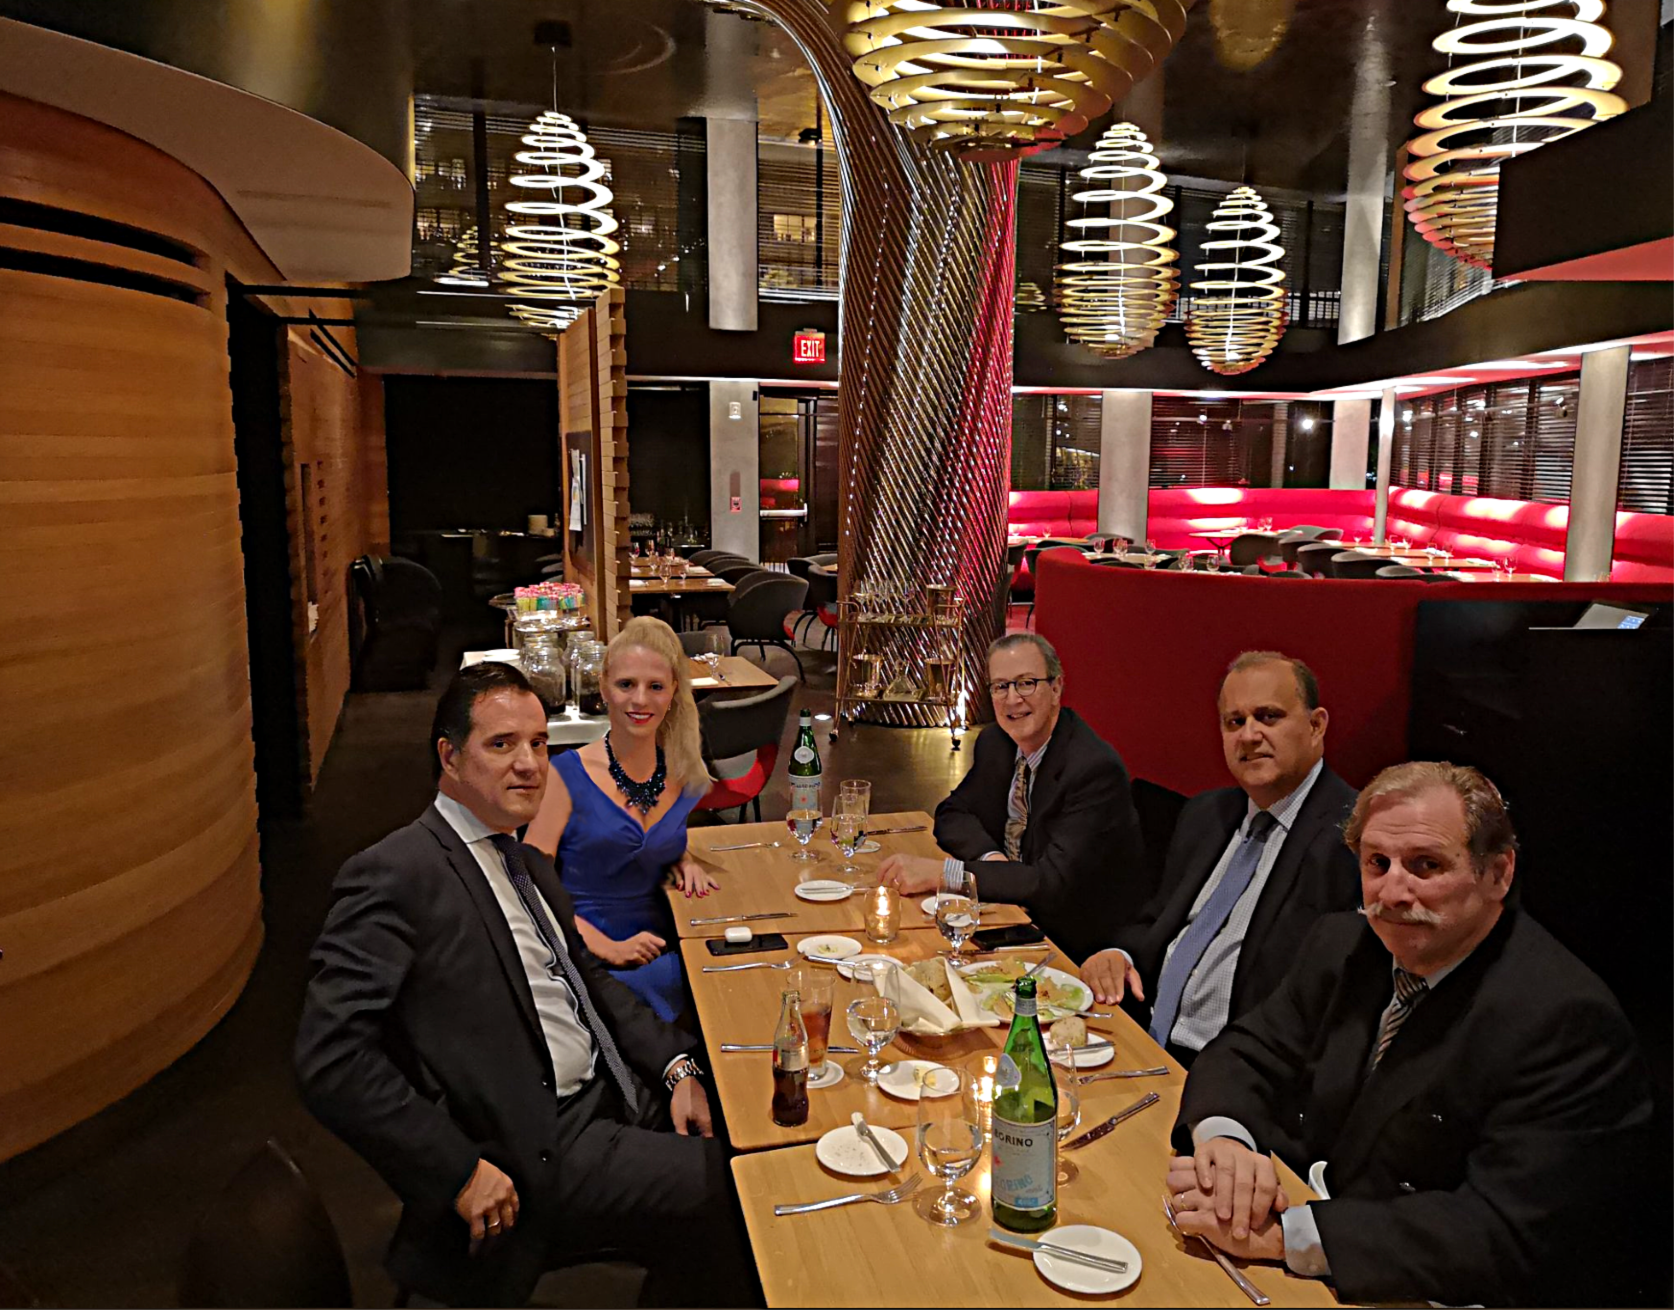 Mr. Georgiadis (lower left) with members of the AHI Board of Directors.